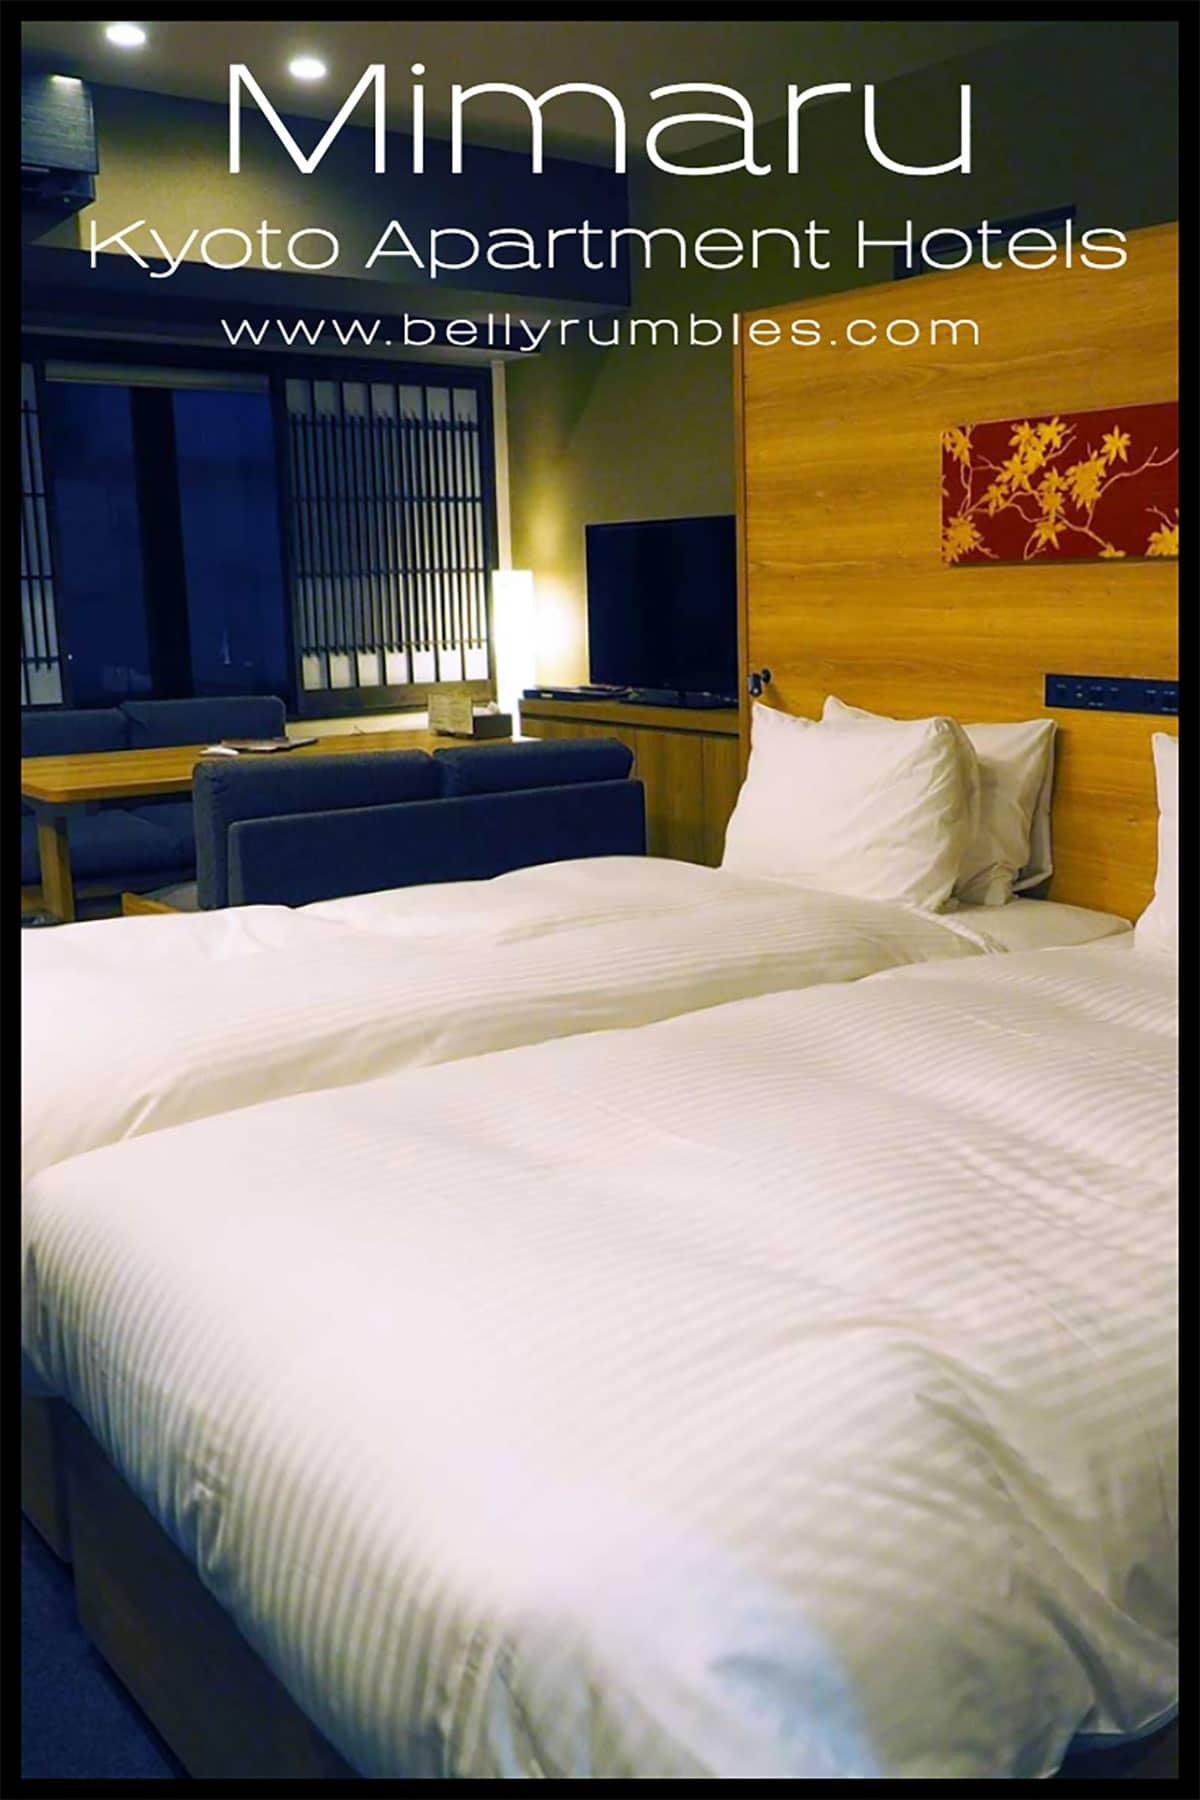 Mimaru Kyoto Apartment Hotel